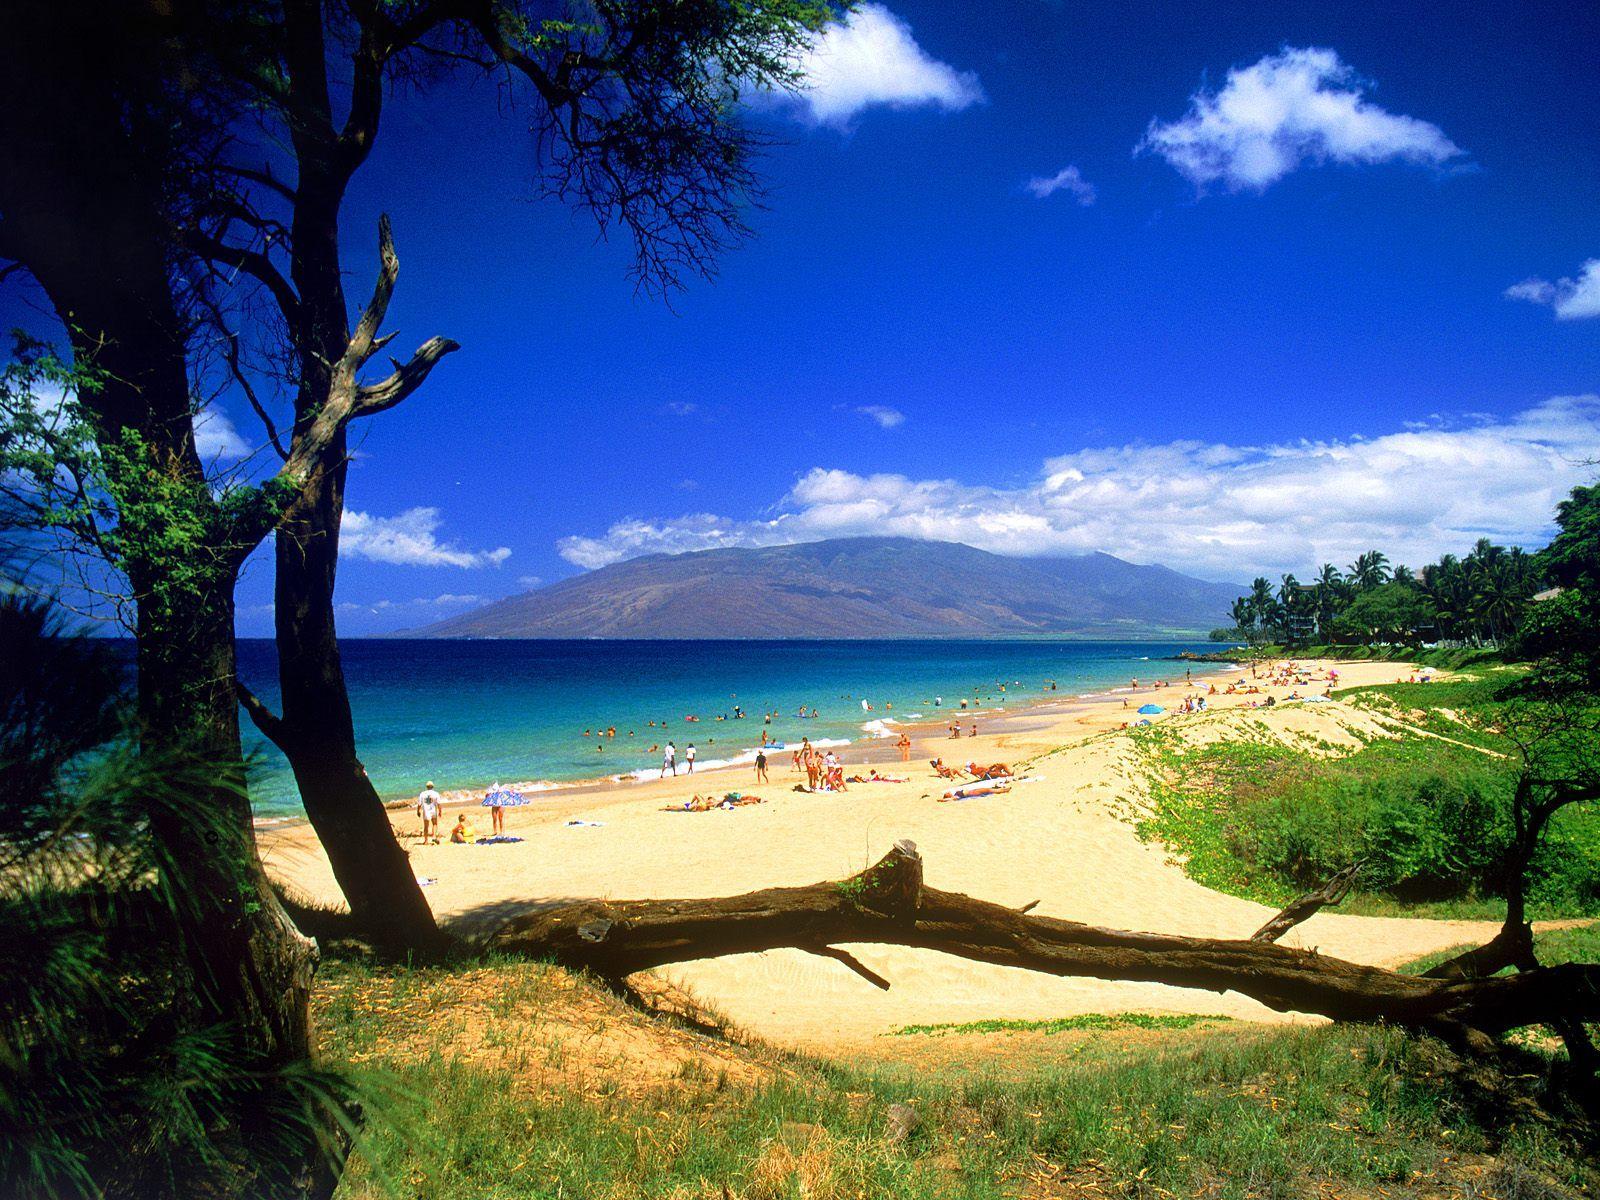 High Resolution Nature Desktop Wallpaper Of Kihei Beach Maui Hawaii ID